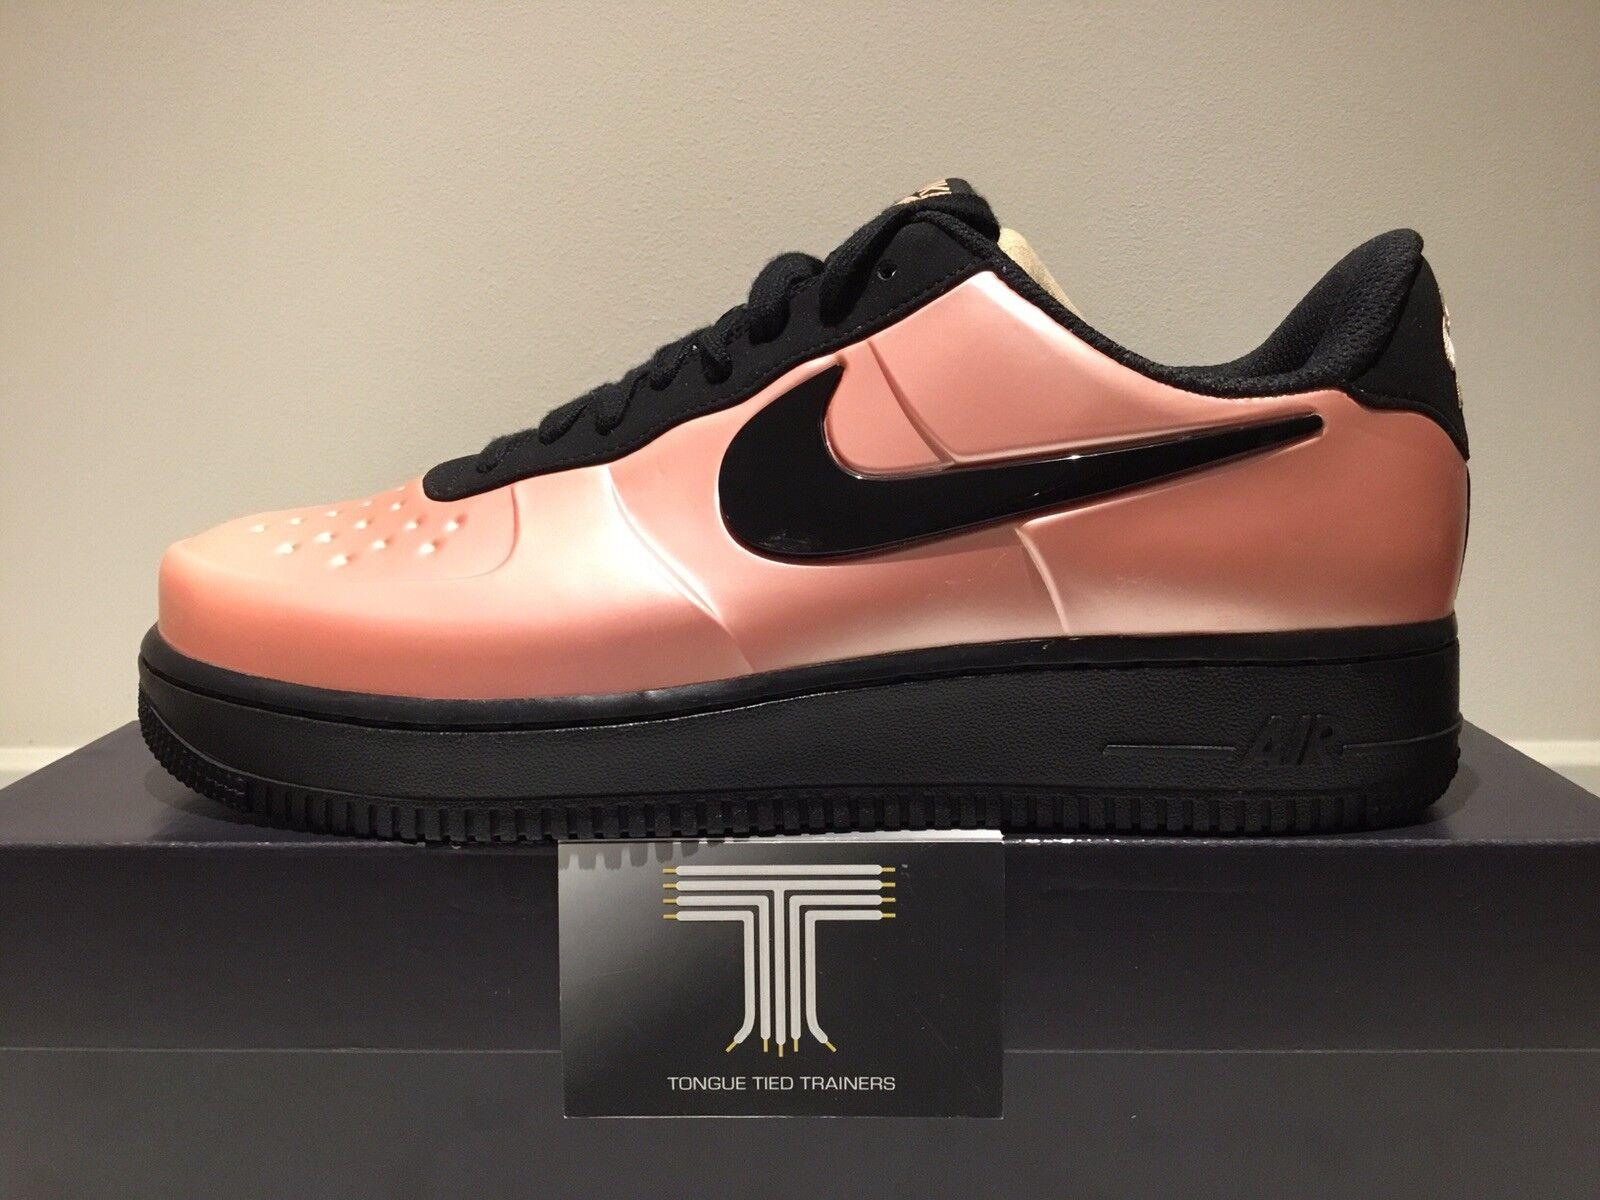 Nike AF1 Air Force 1 Foamposite Pro Cup Coral Coral Coral Stardust  AJ3664 600  Uk Größe 10 7c6473